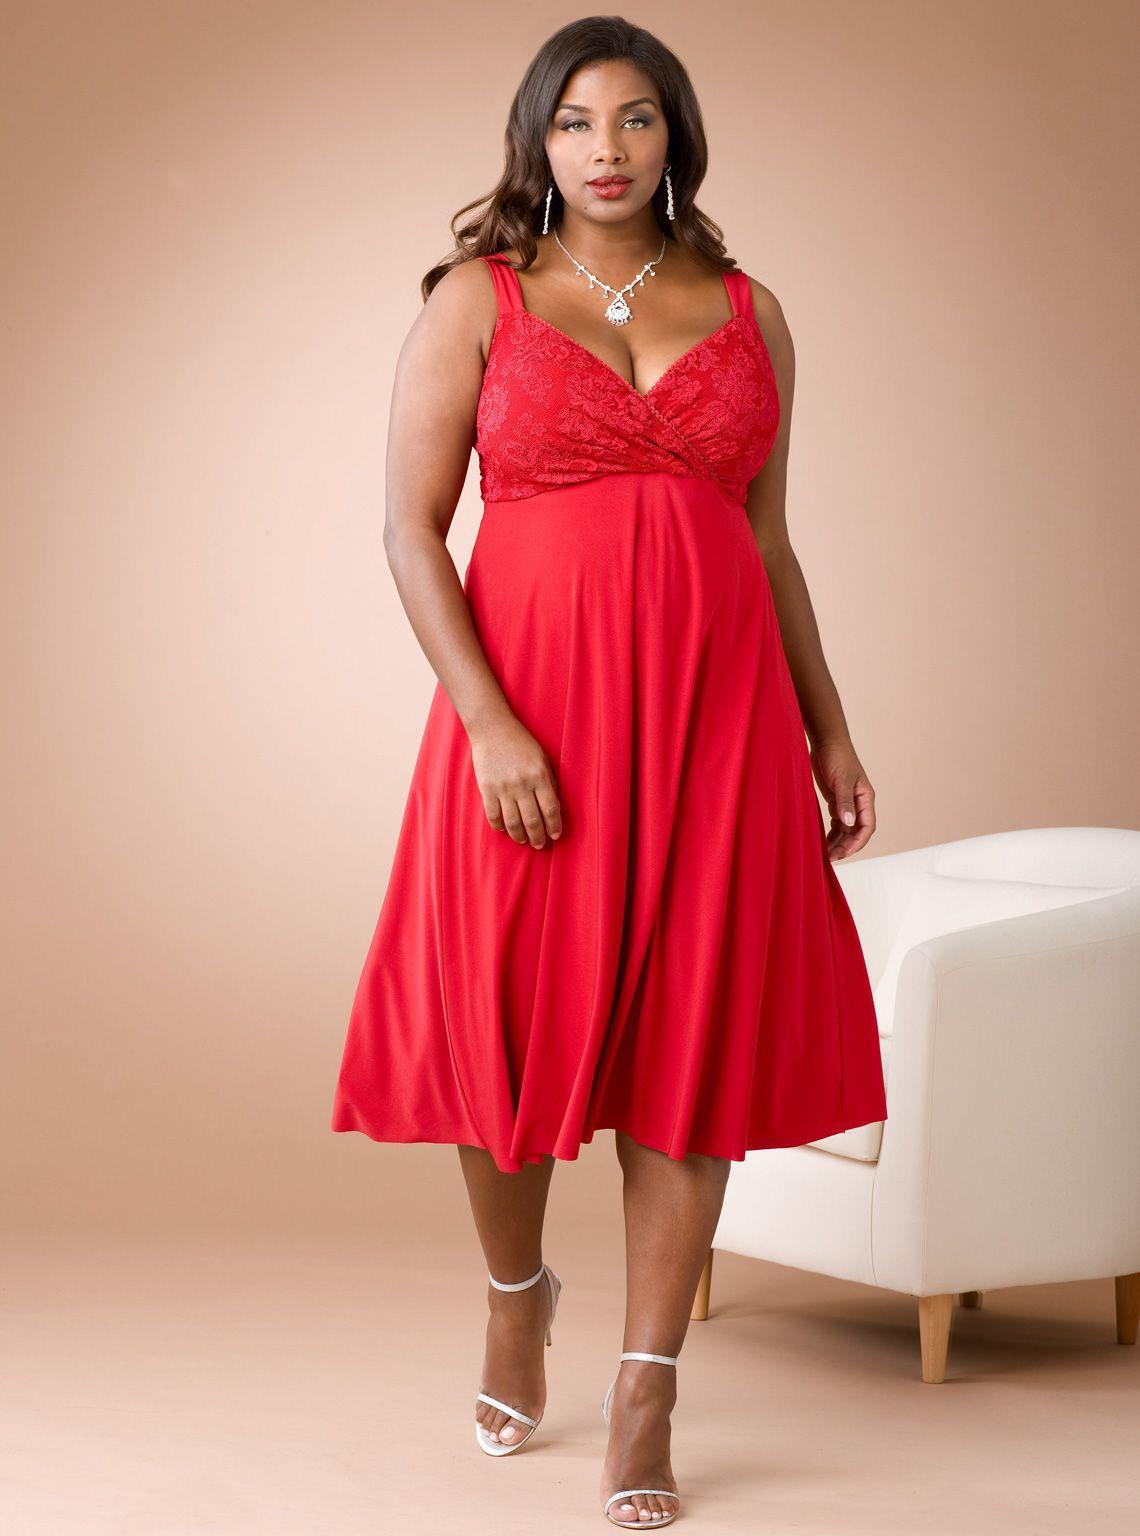 Plus Size Prom Dresses Plusizepromdress127cheap Prom Dressevening